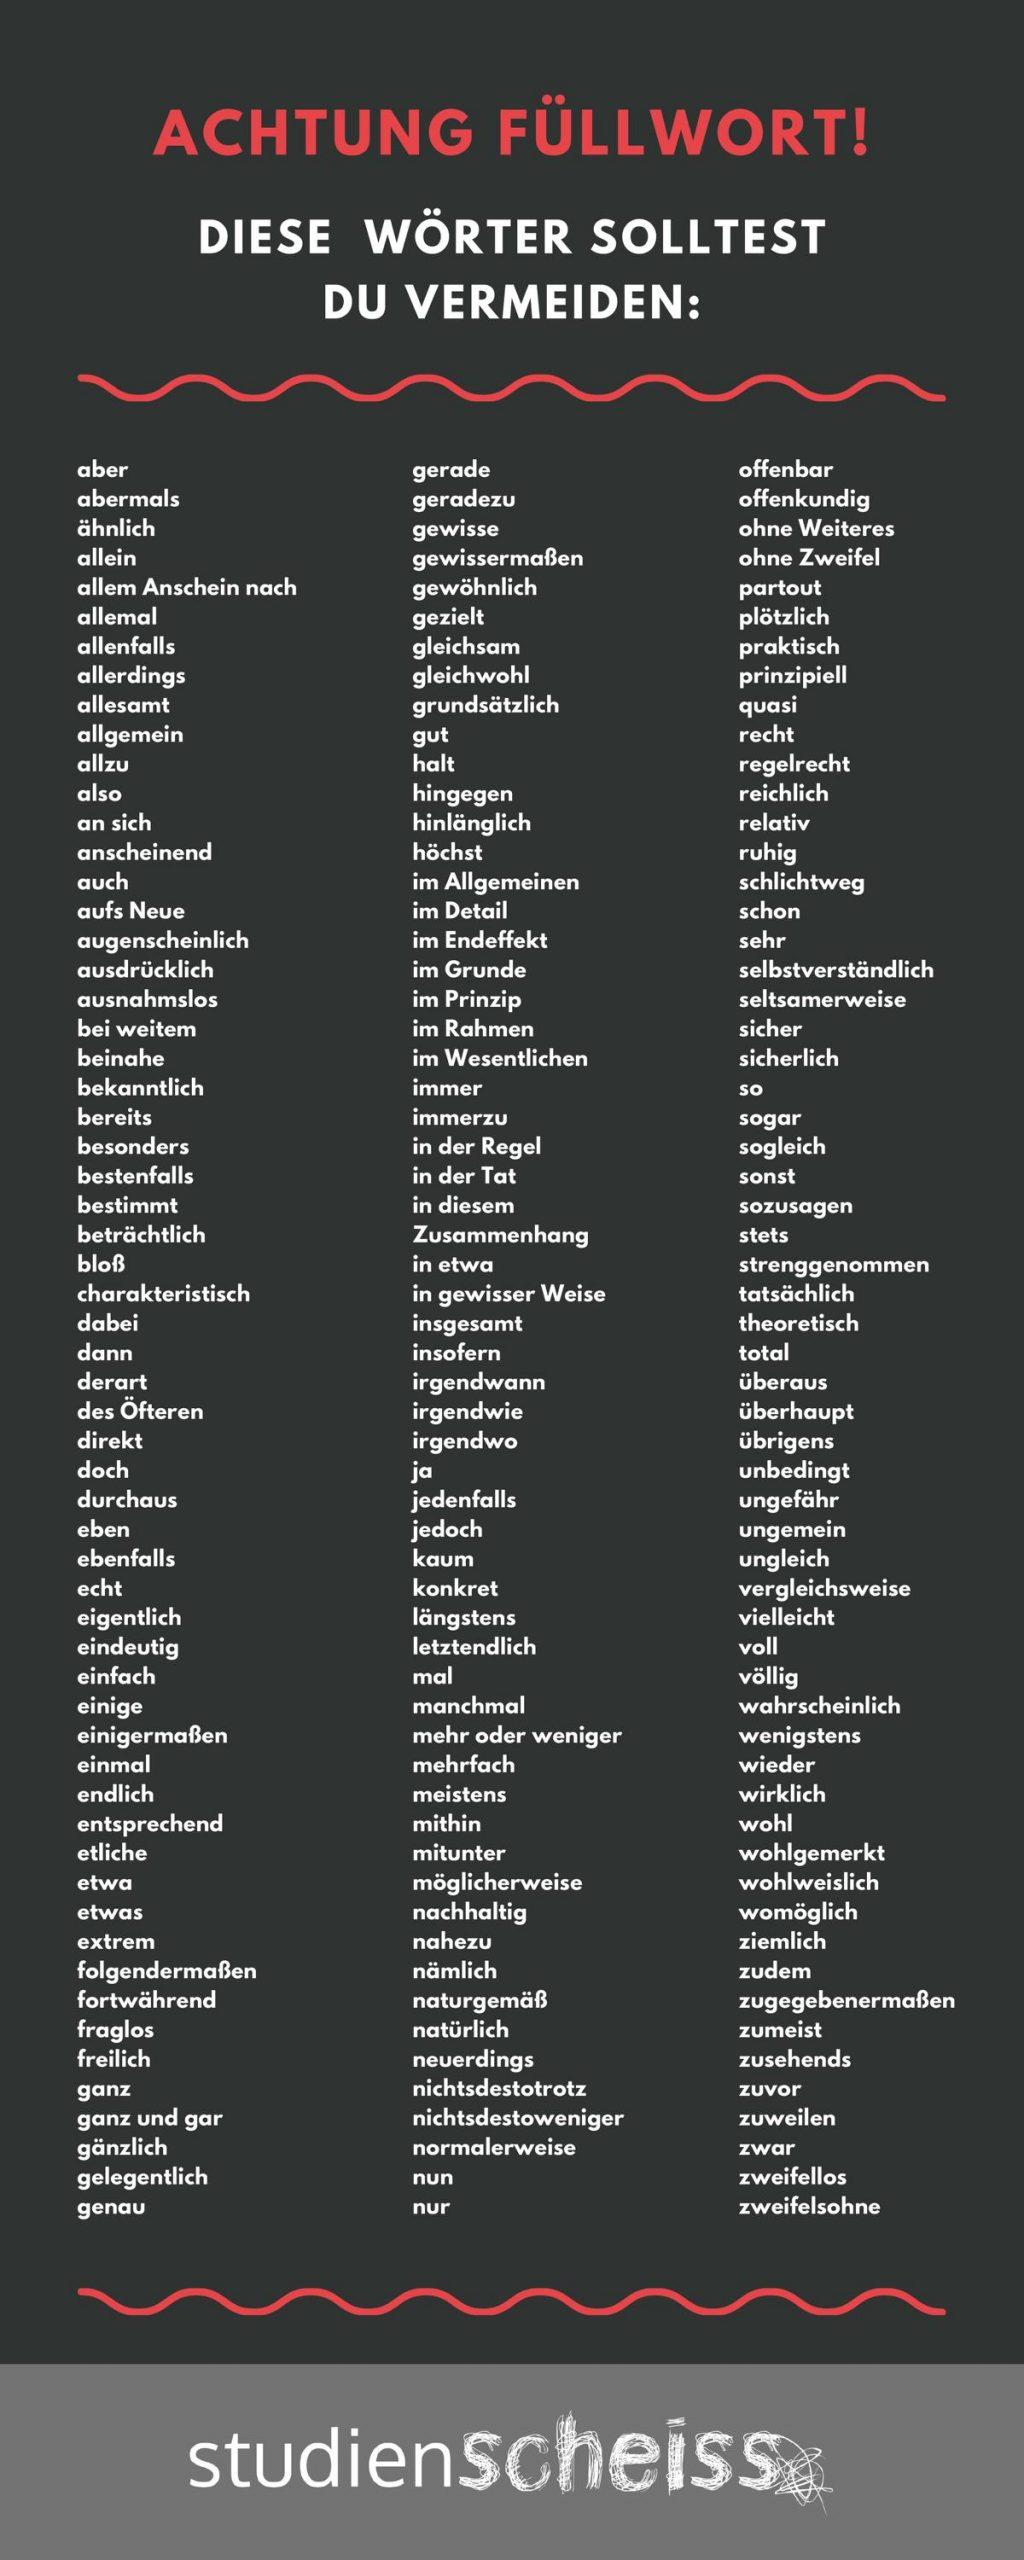 Alle Füllwörter im Überblick